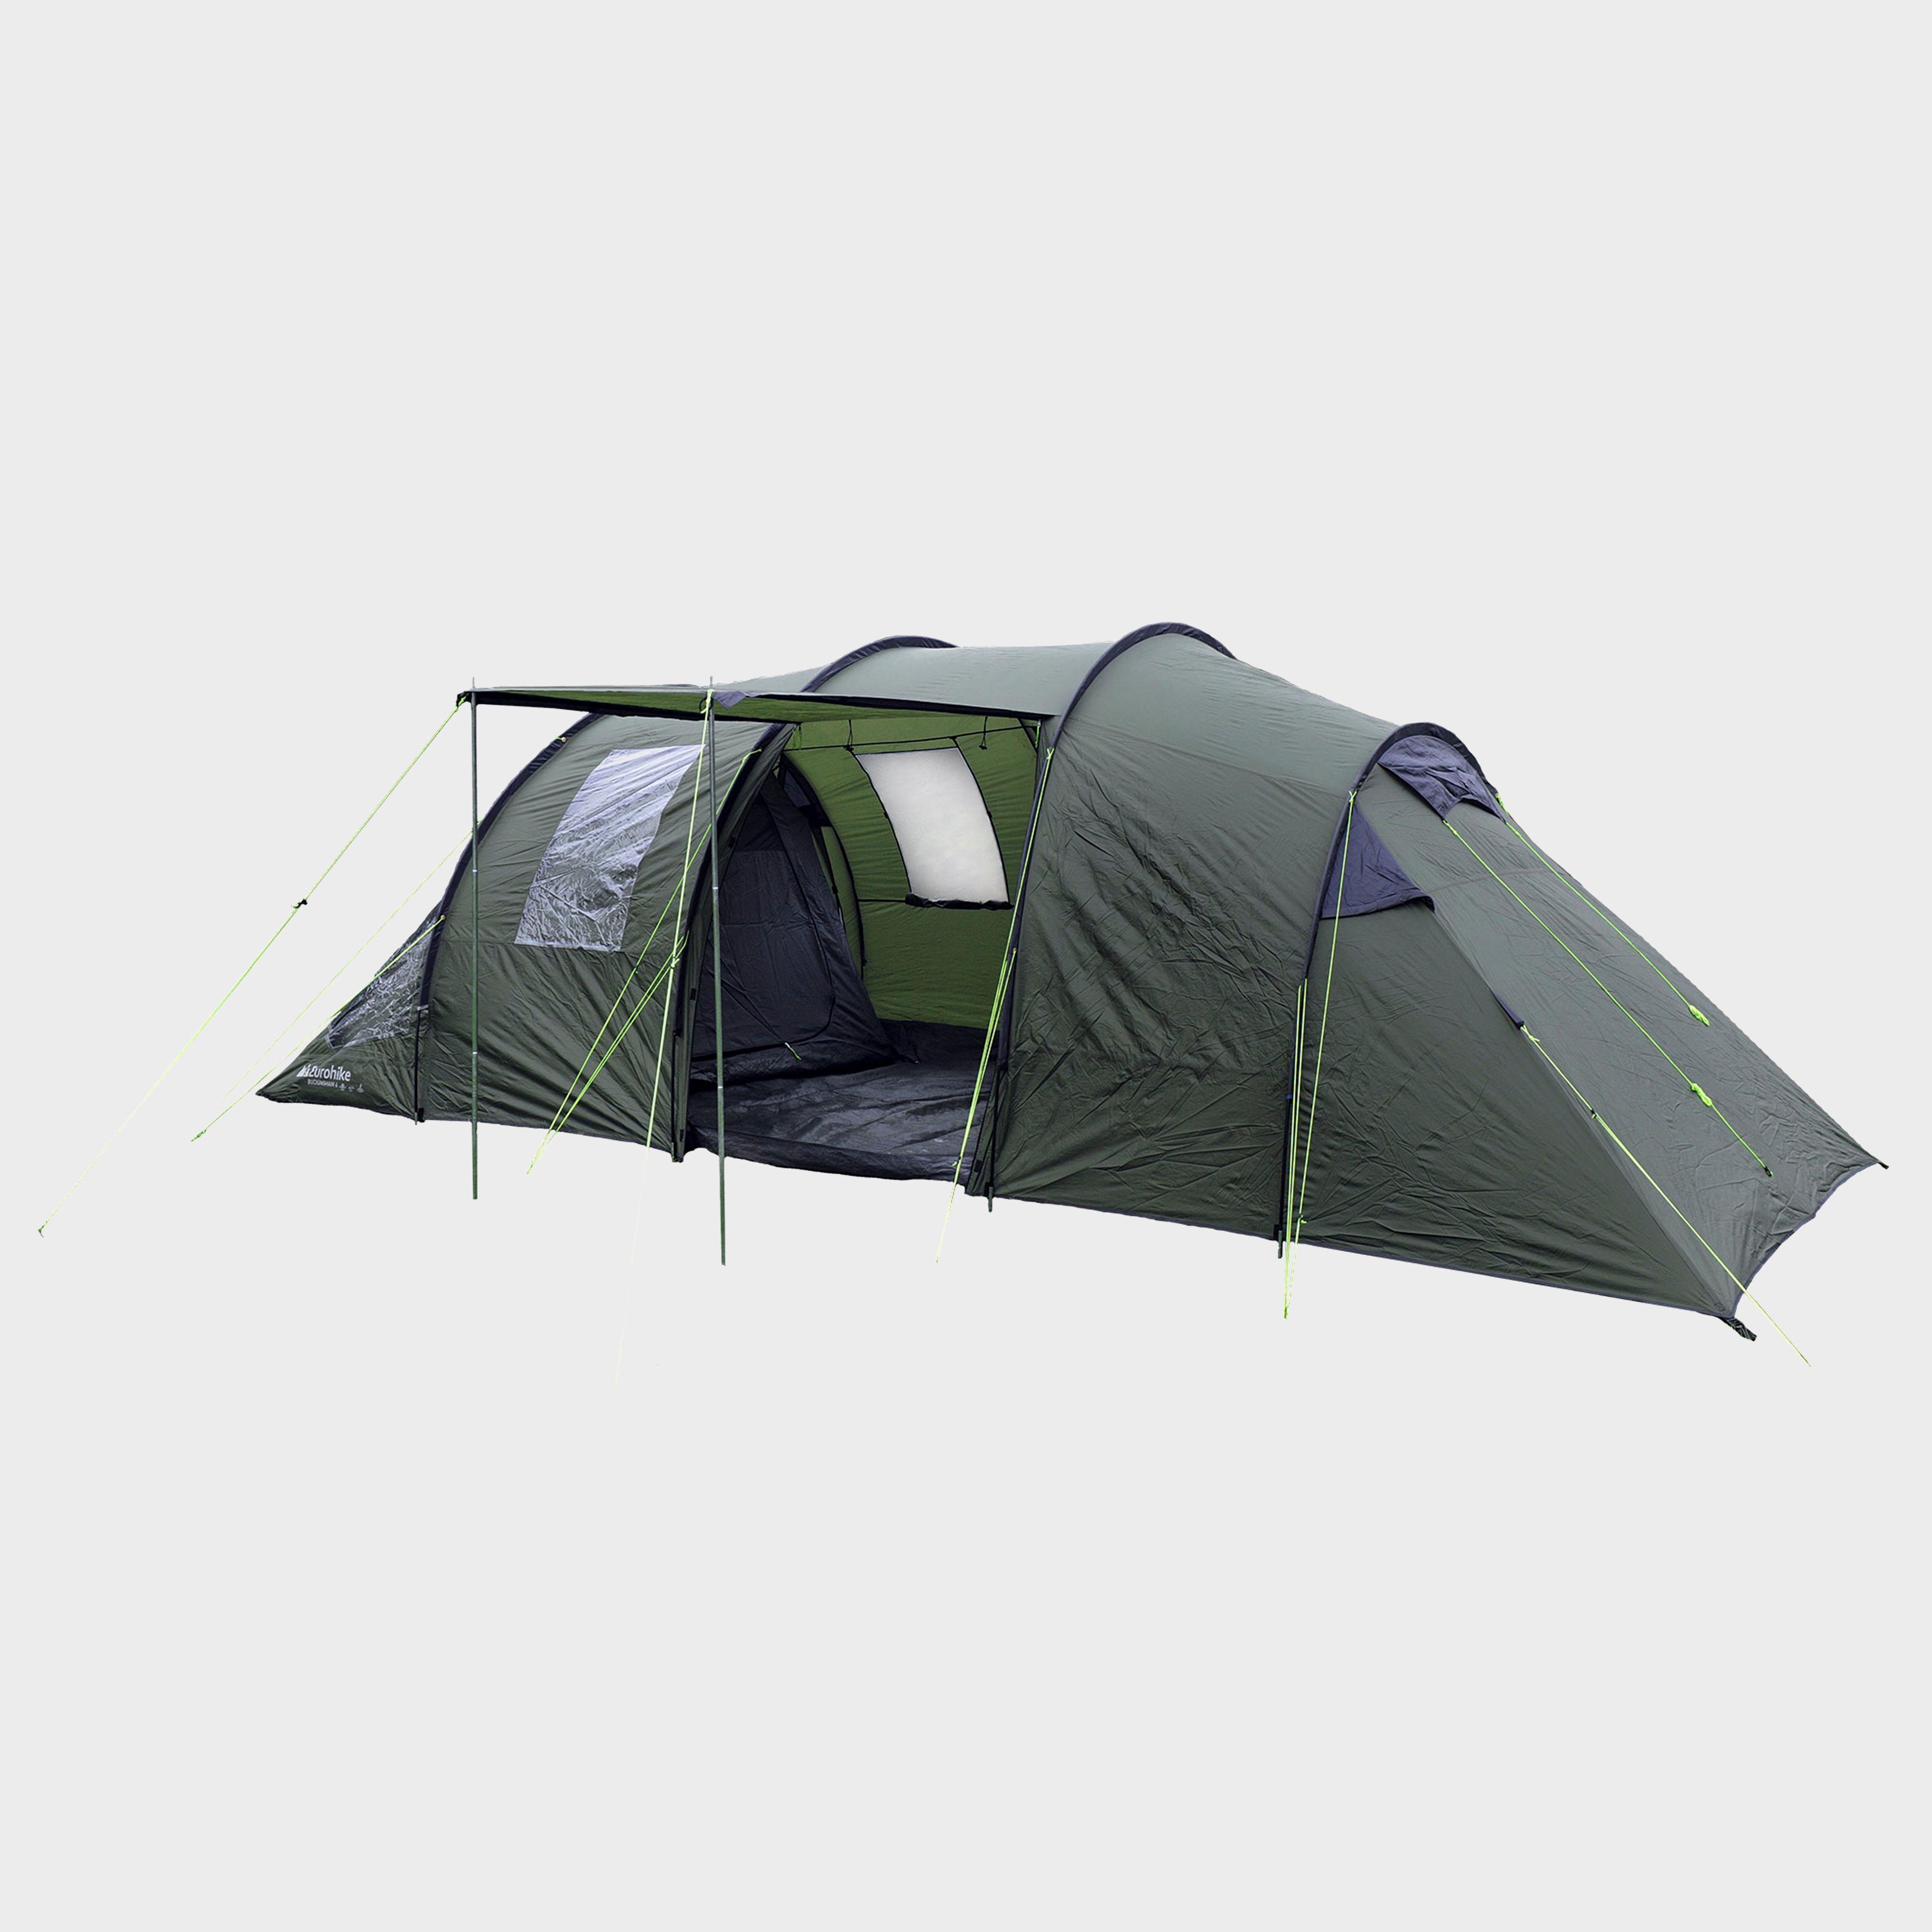 Millets & 6 Man Tent u0026 6 Person Tents | Large Group Tents | Millets